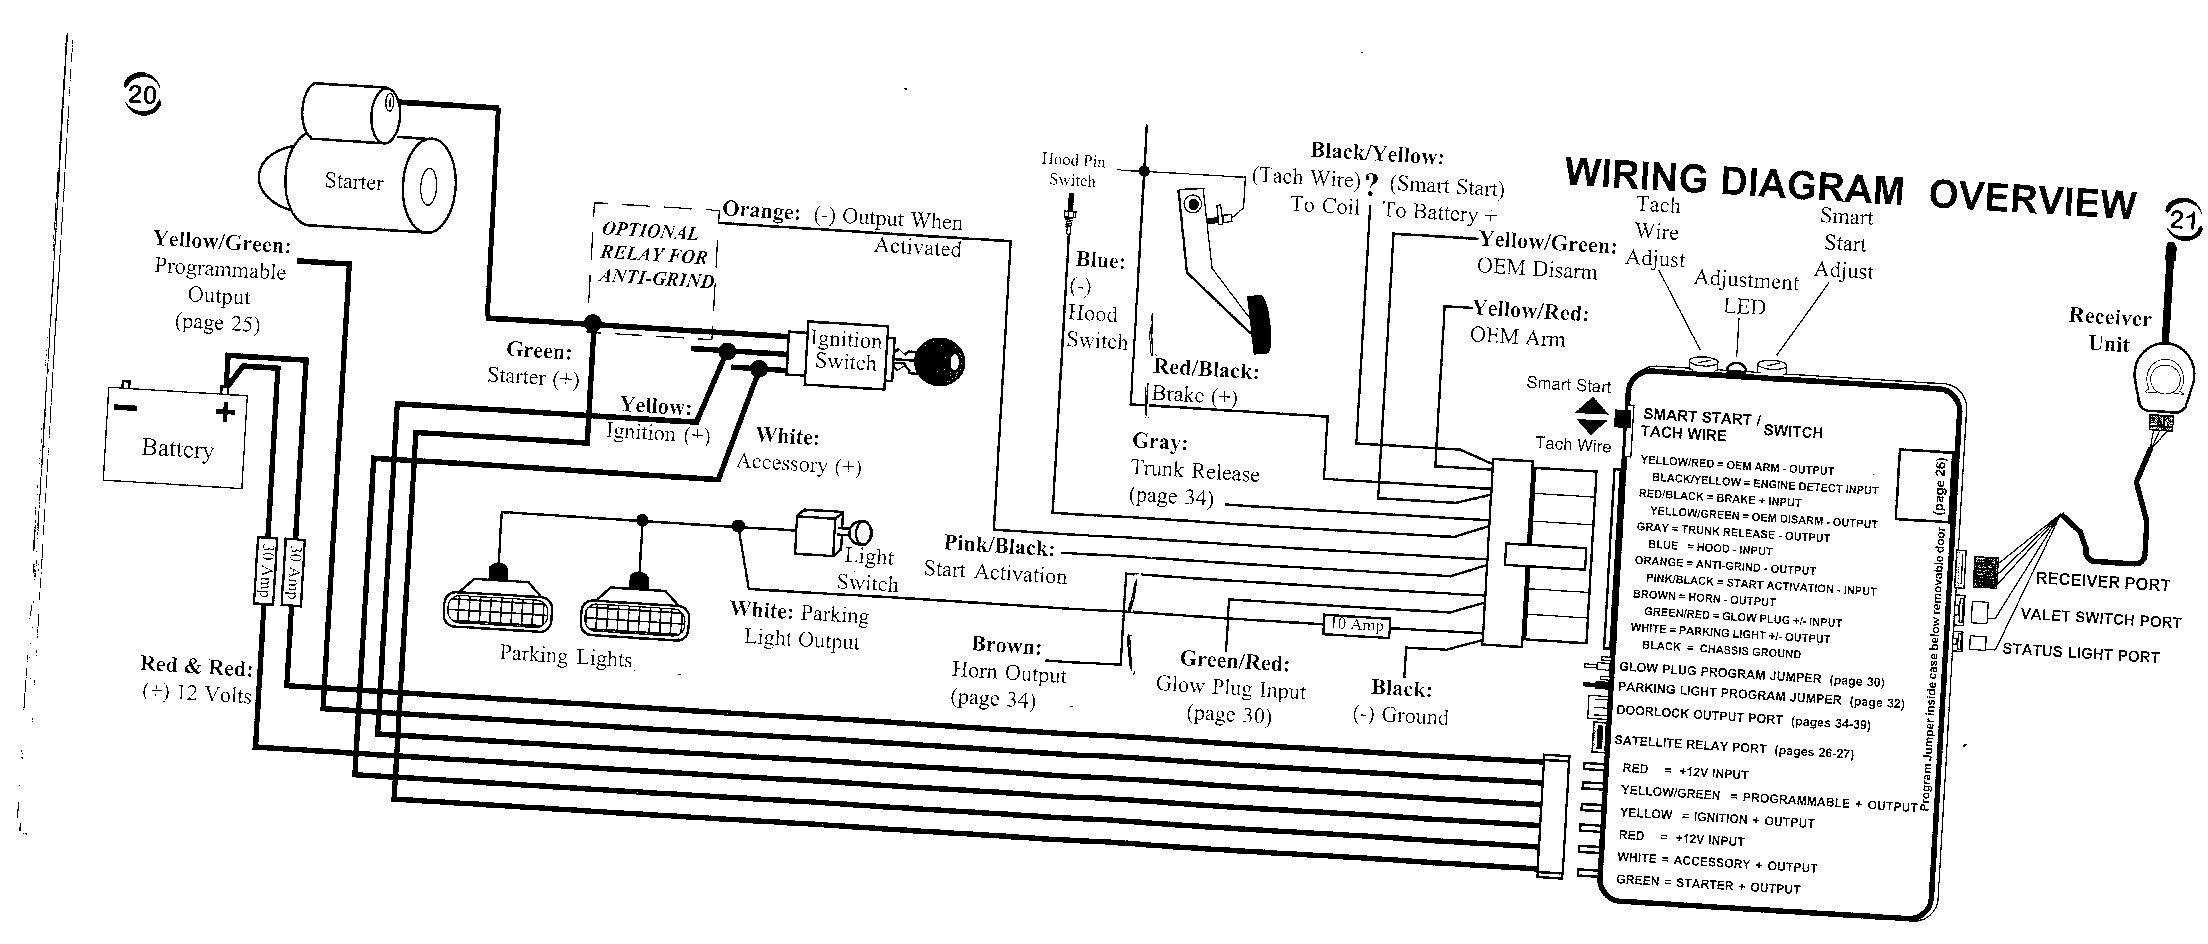 Viper 5706 Wiring Diagram In 2020 Viper Car Brakes Car Car Alarm